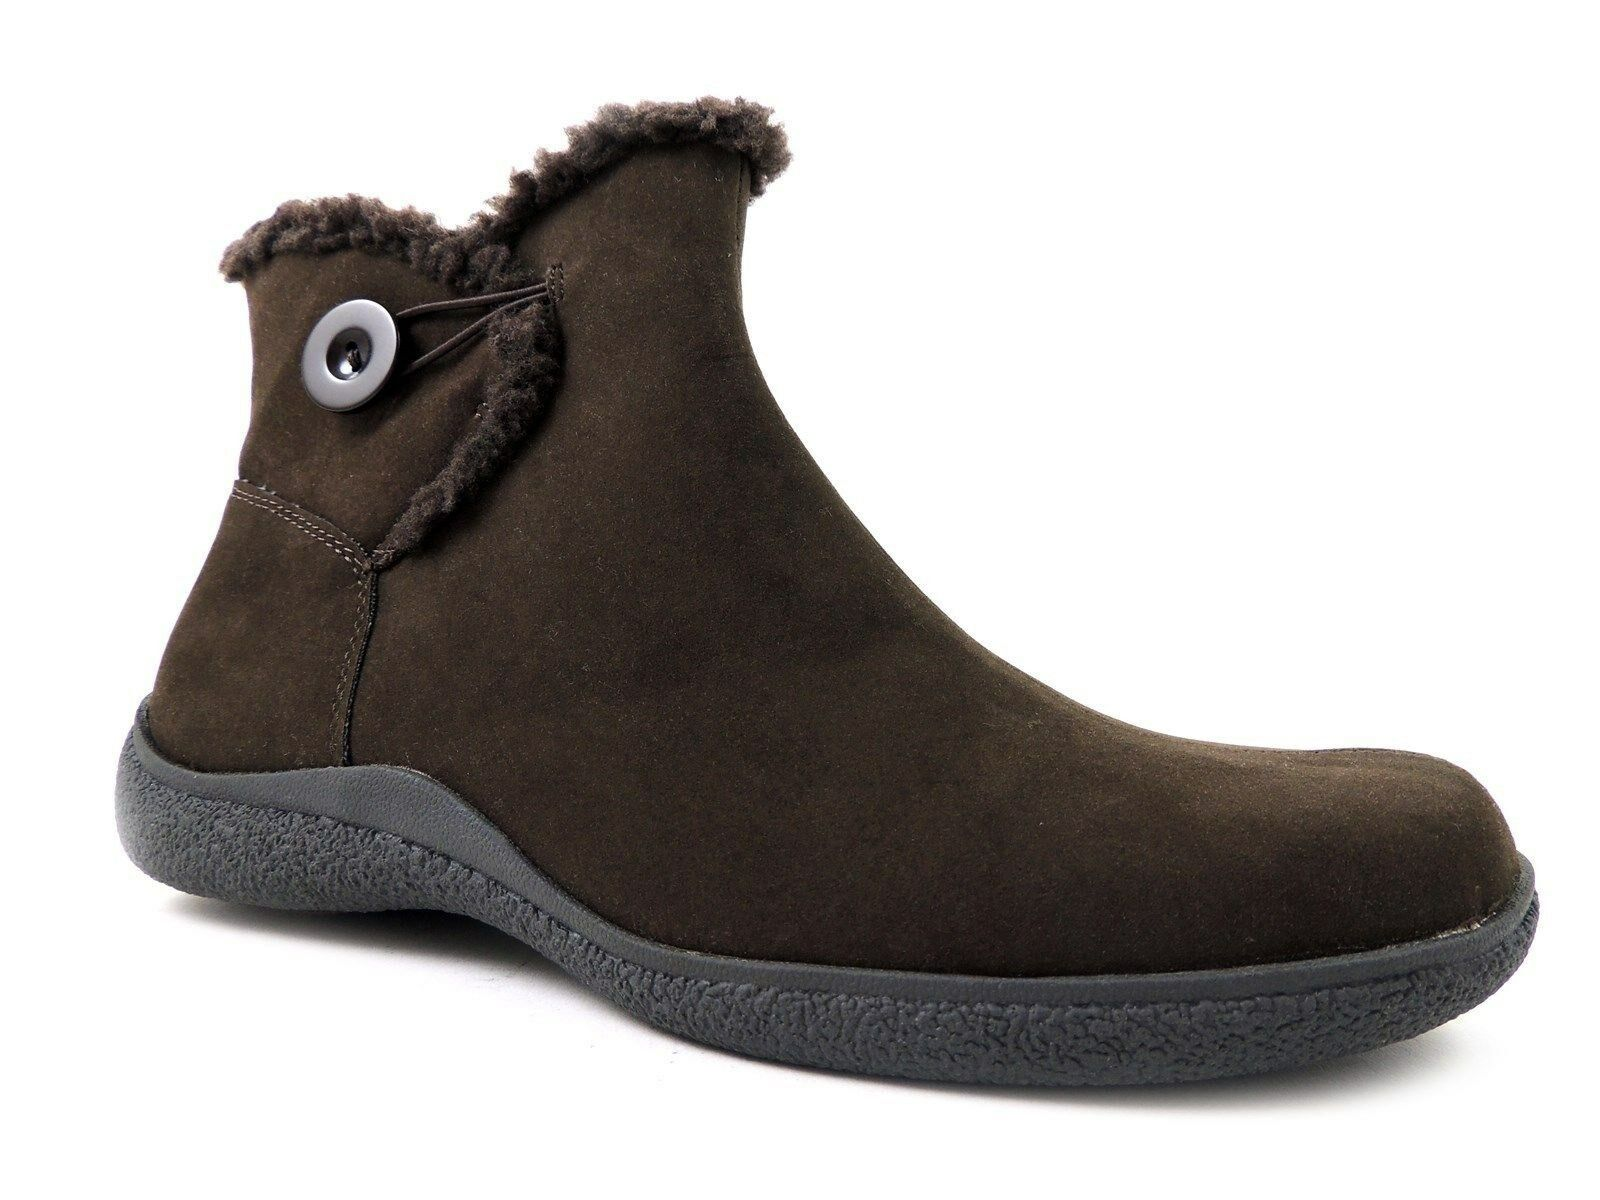 Karen Scott Women's Grady Cold Winter W/Button Ankle-Boots Brown Sz 9.5 M